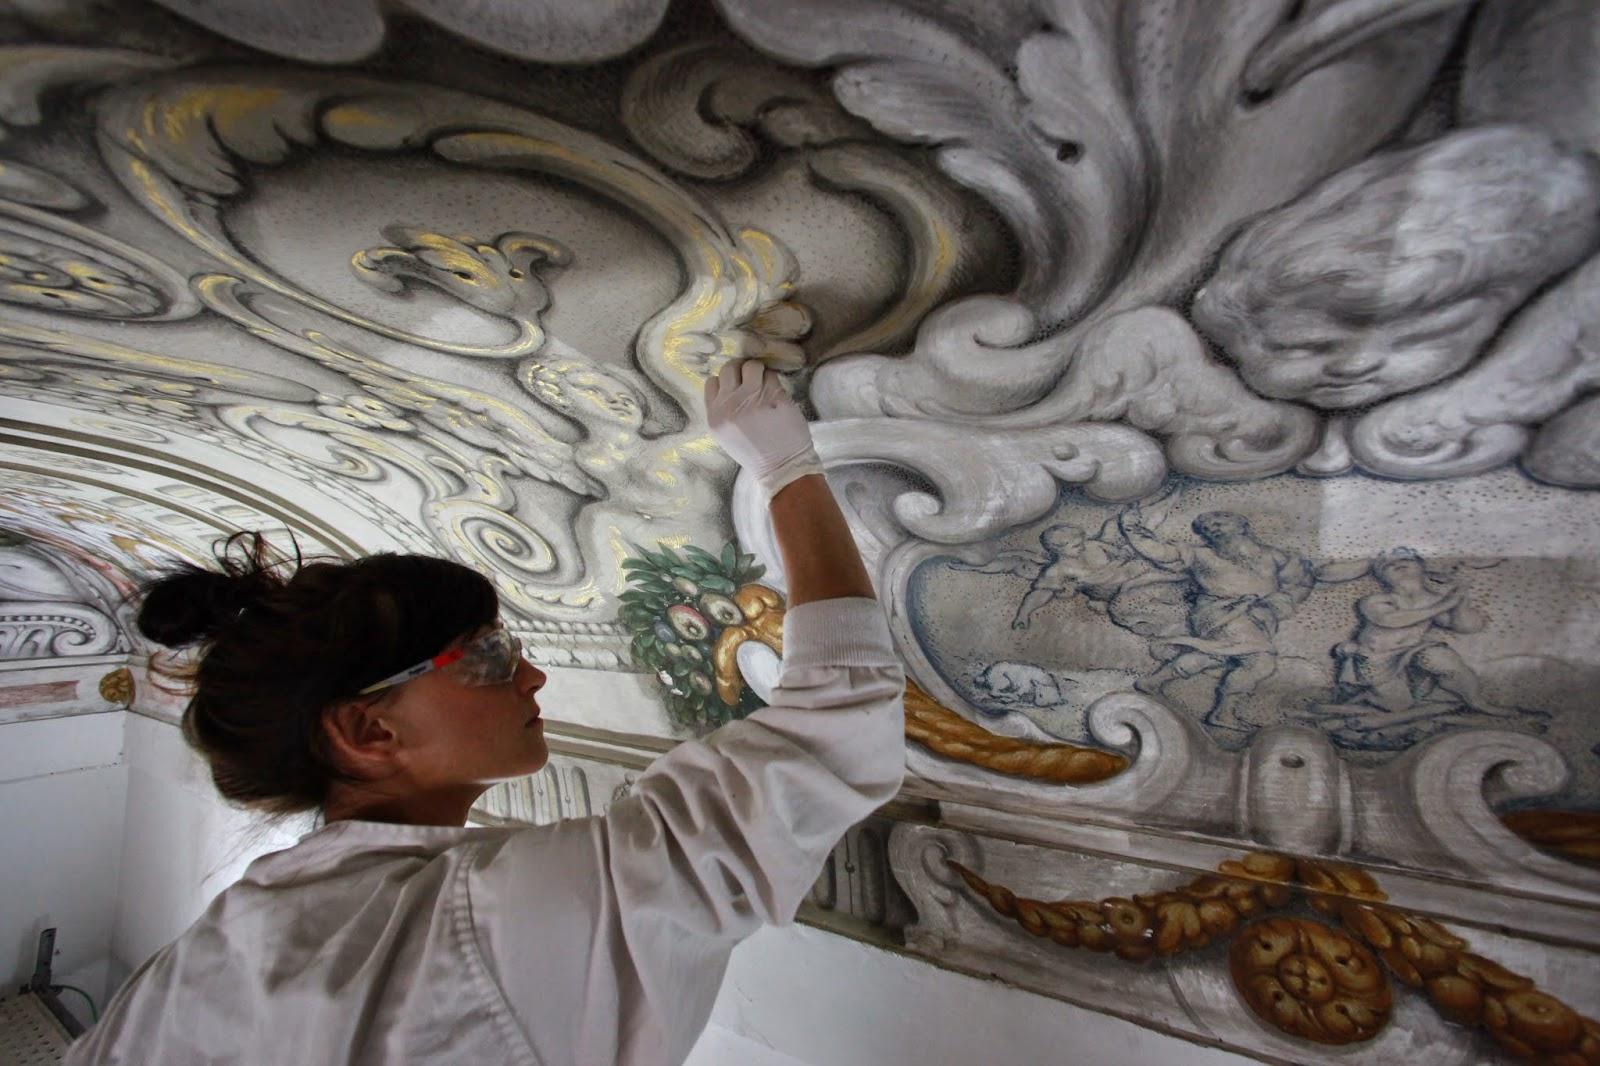 Restauraci n de obras de arte la pintura mural parte 1 for Murales de fotos para pared